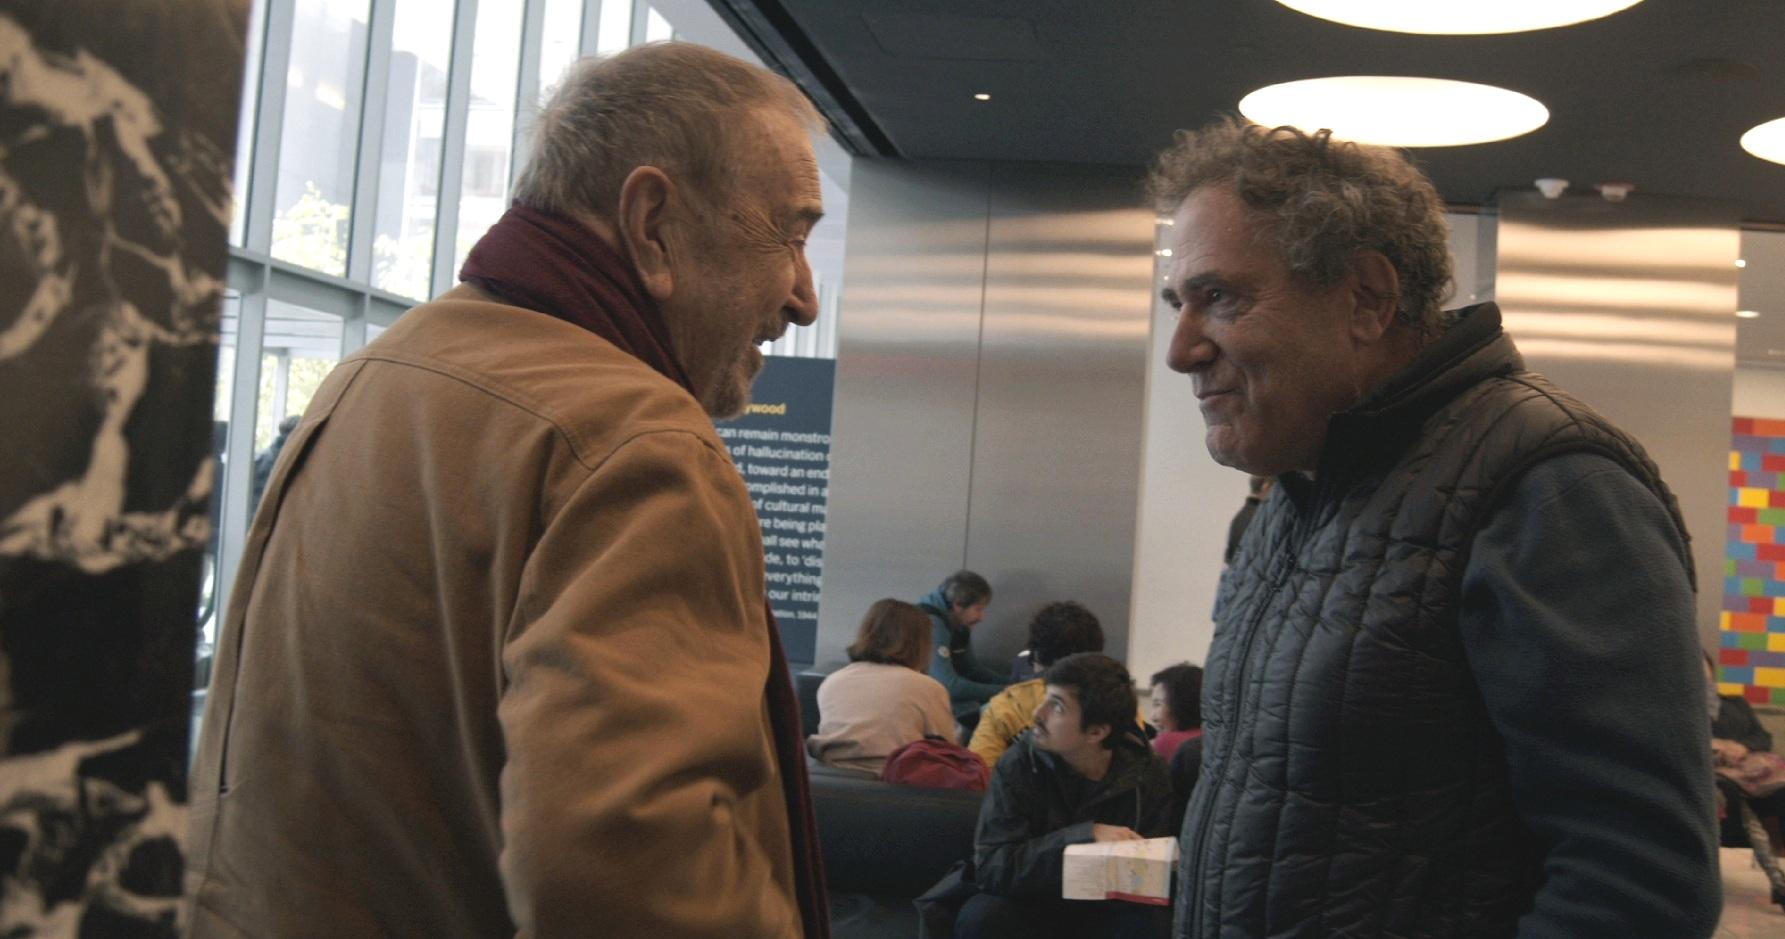 Jean-Claude Carrière and Jon Gartenberg at the museum of modern art retrospective of Carrière's films, 2019